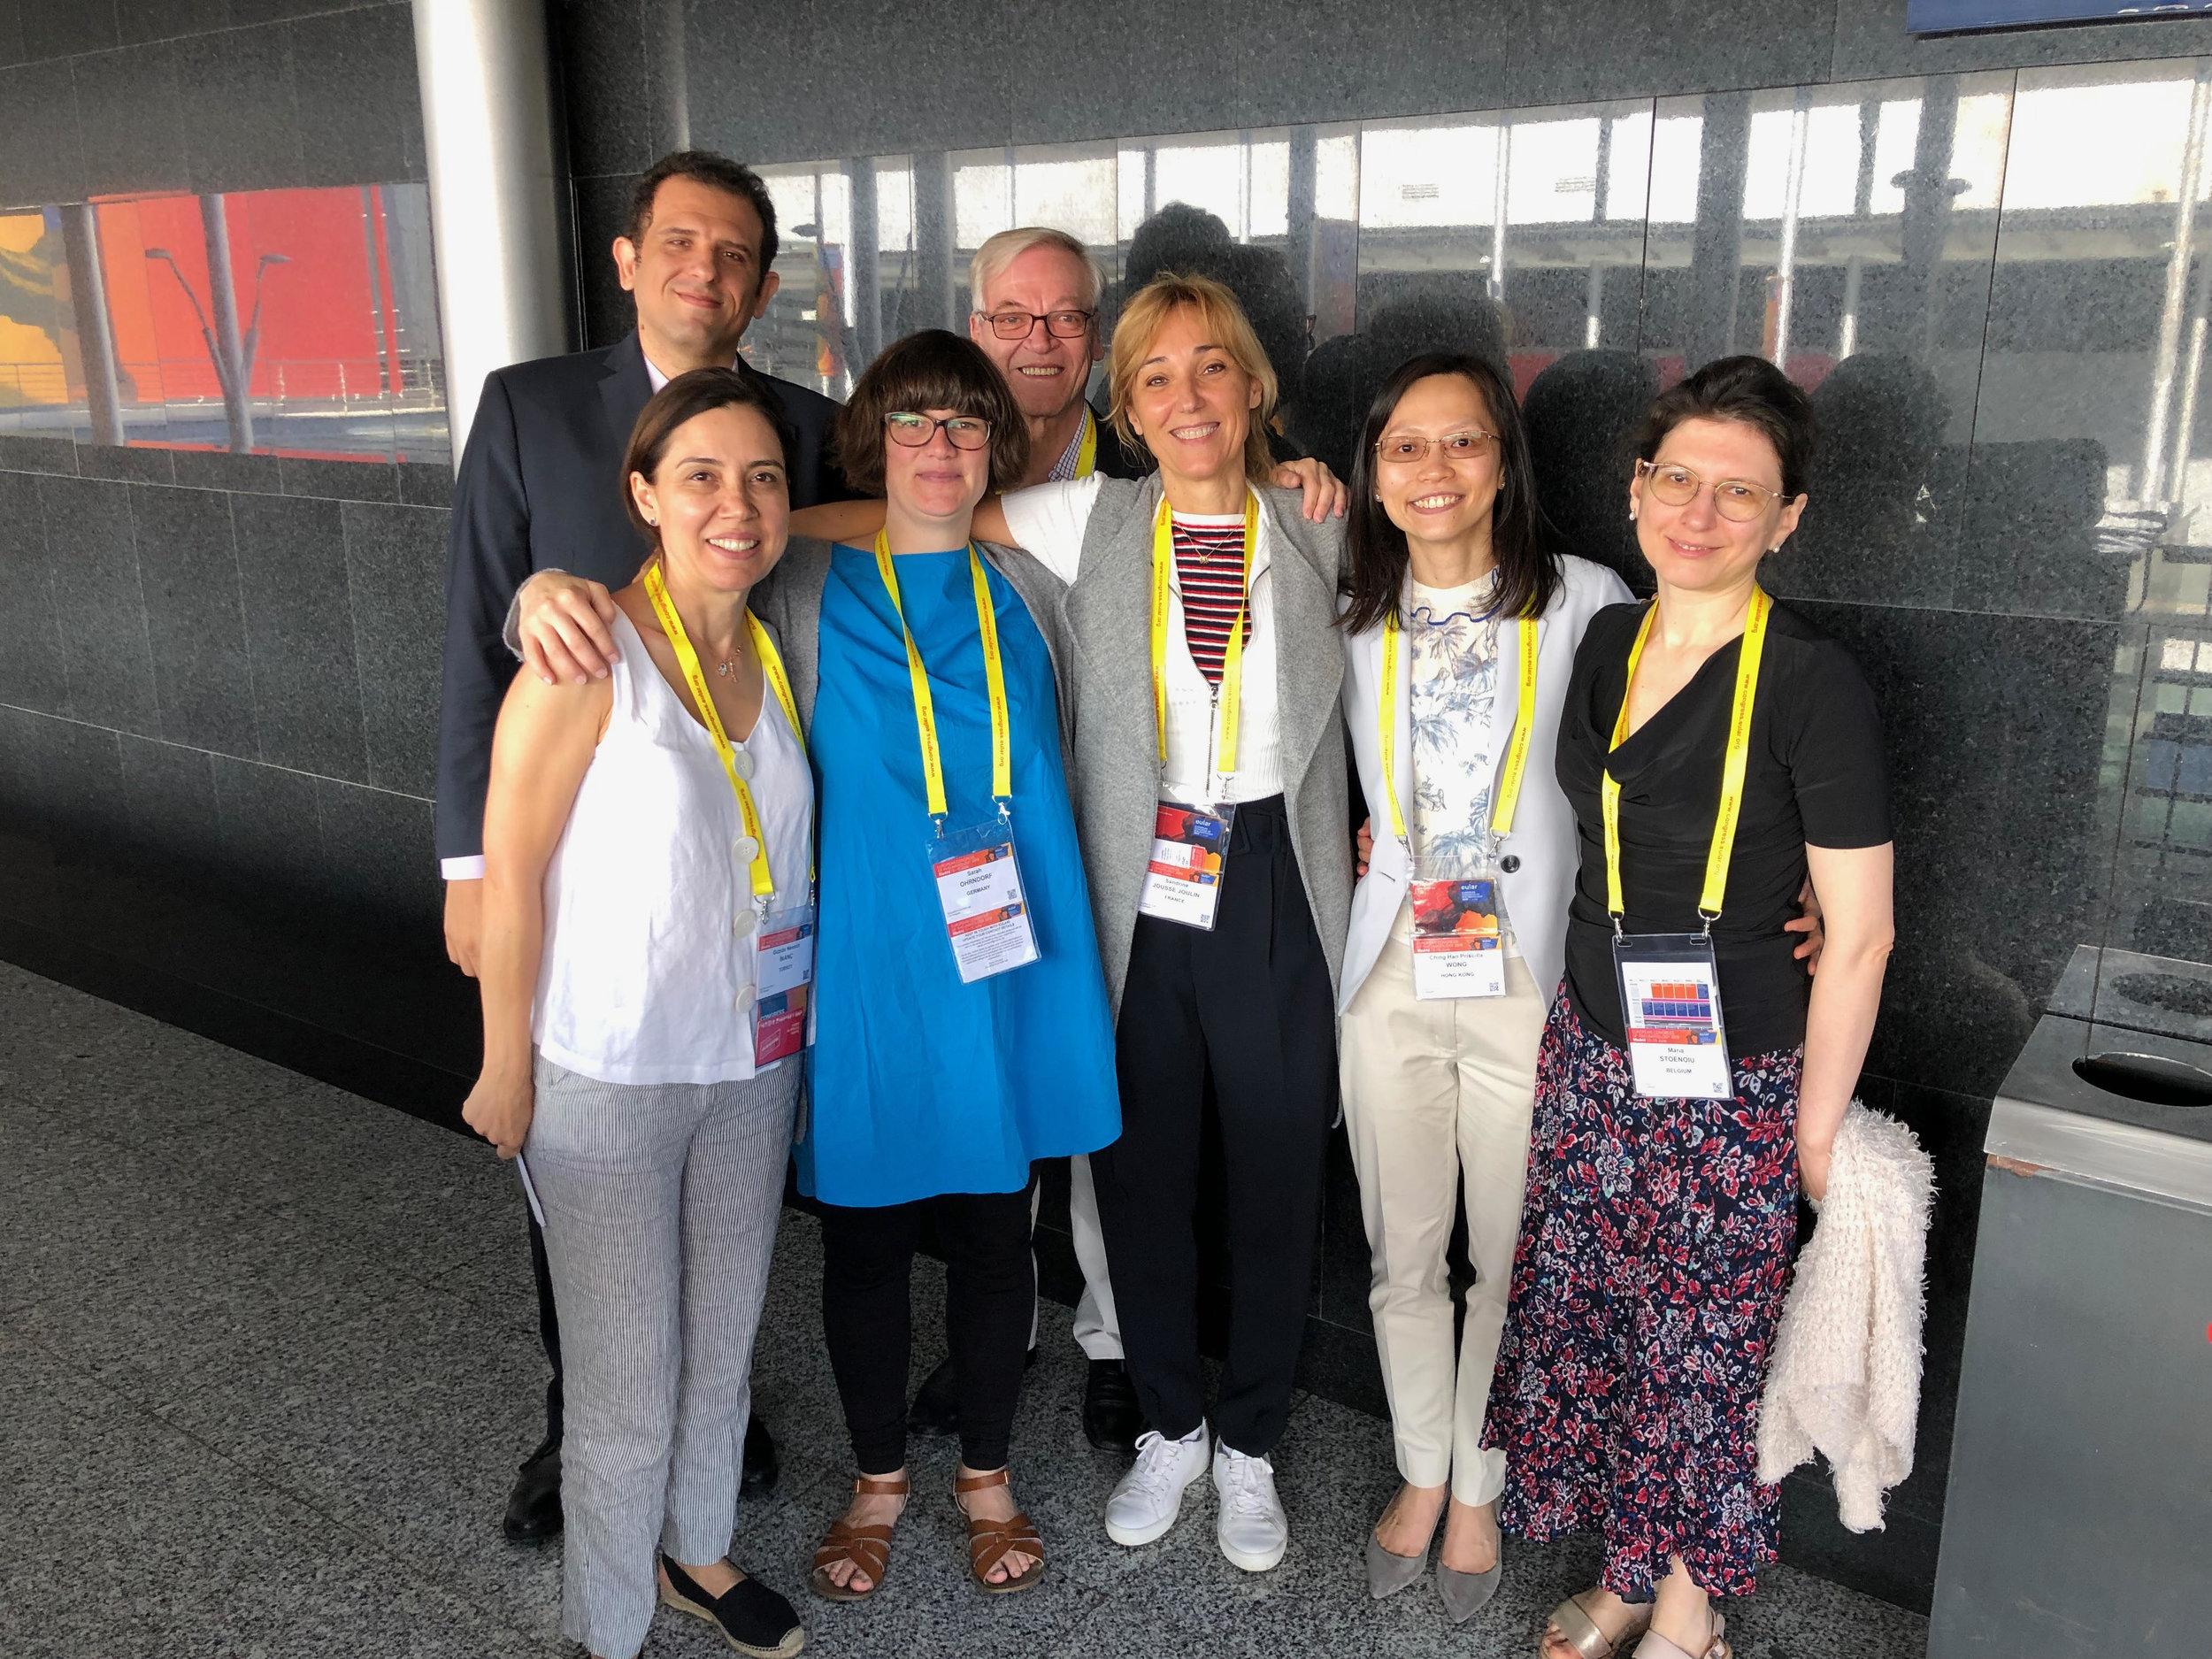 Lupus group photo (14 Jun 2019).jpg